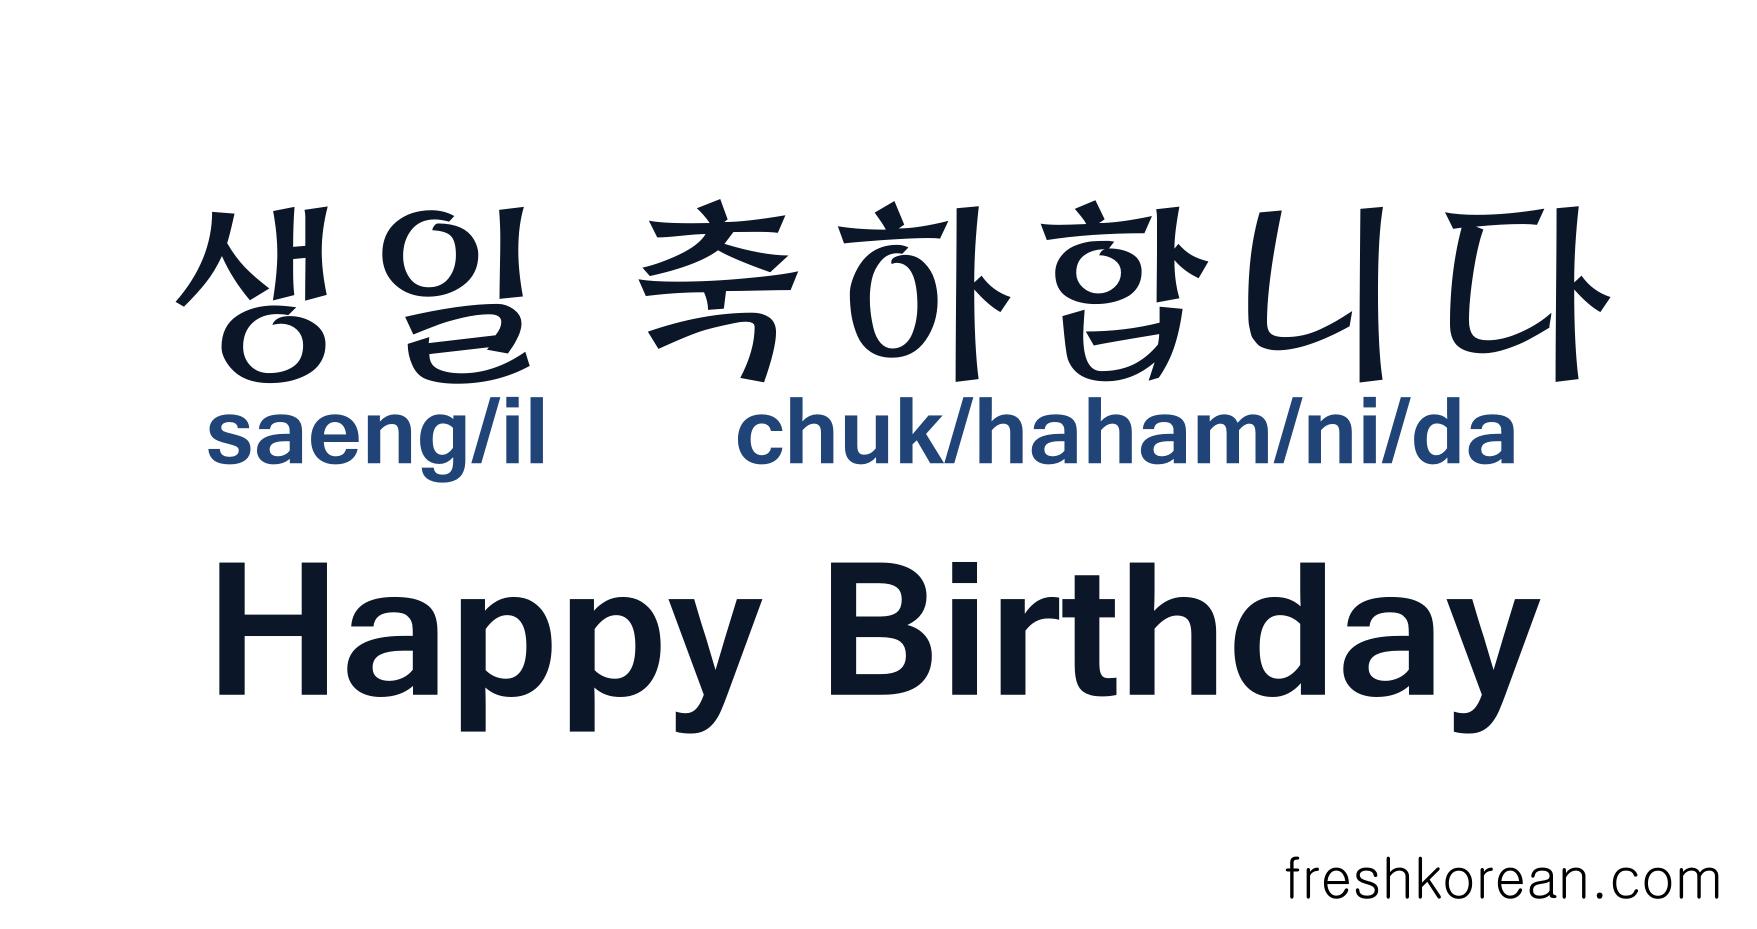 How to write happy halloween in korean